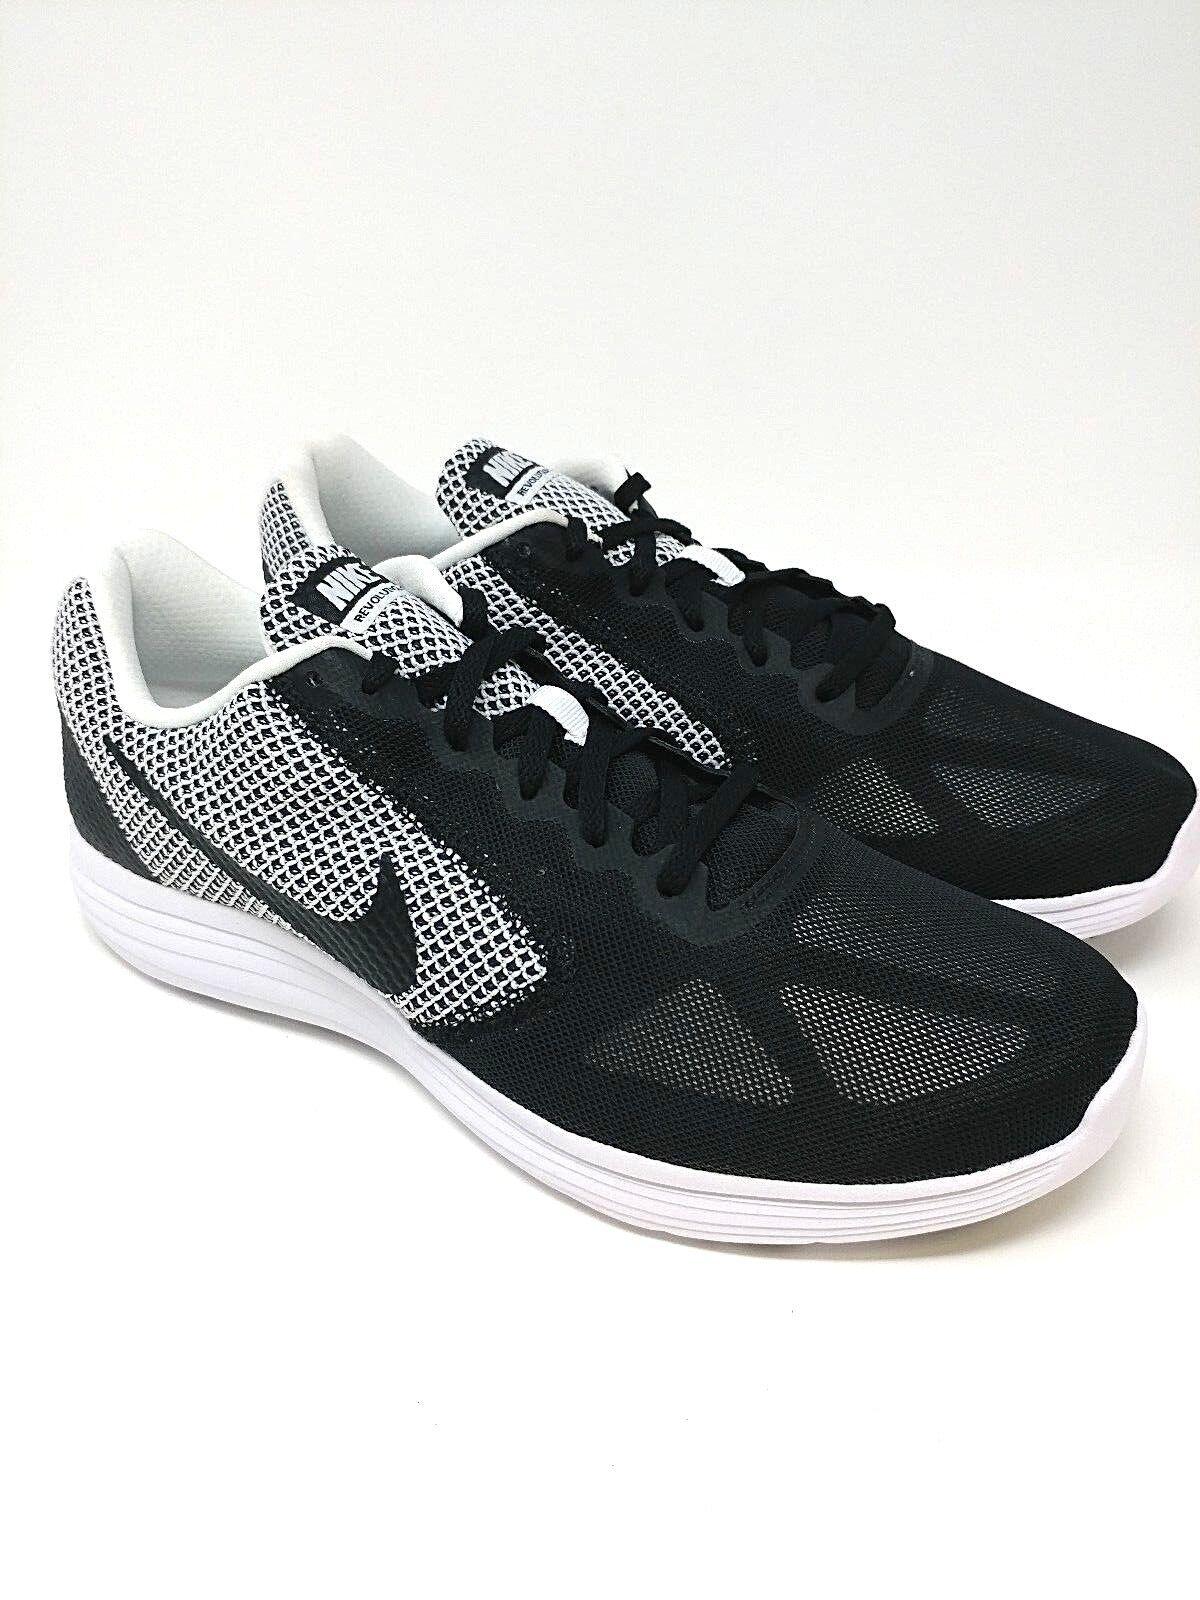 Nike Revolution 3 SIZE 11 White Black